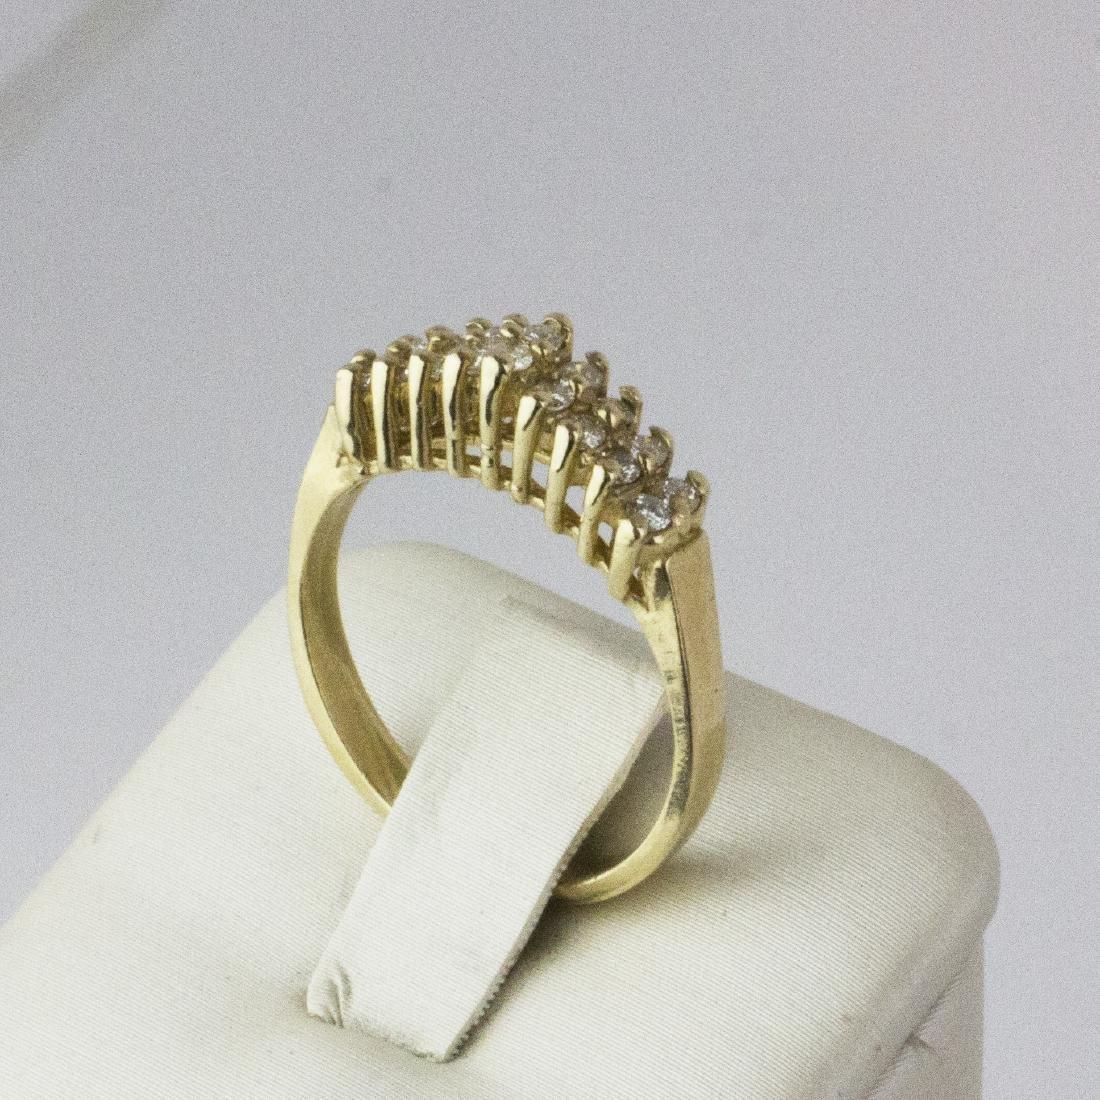 14K Yellow Gold Diamond Pyramid Design Ring - 4